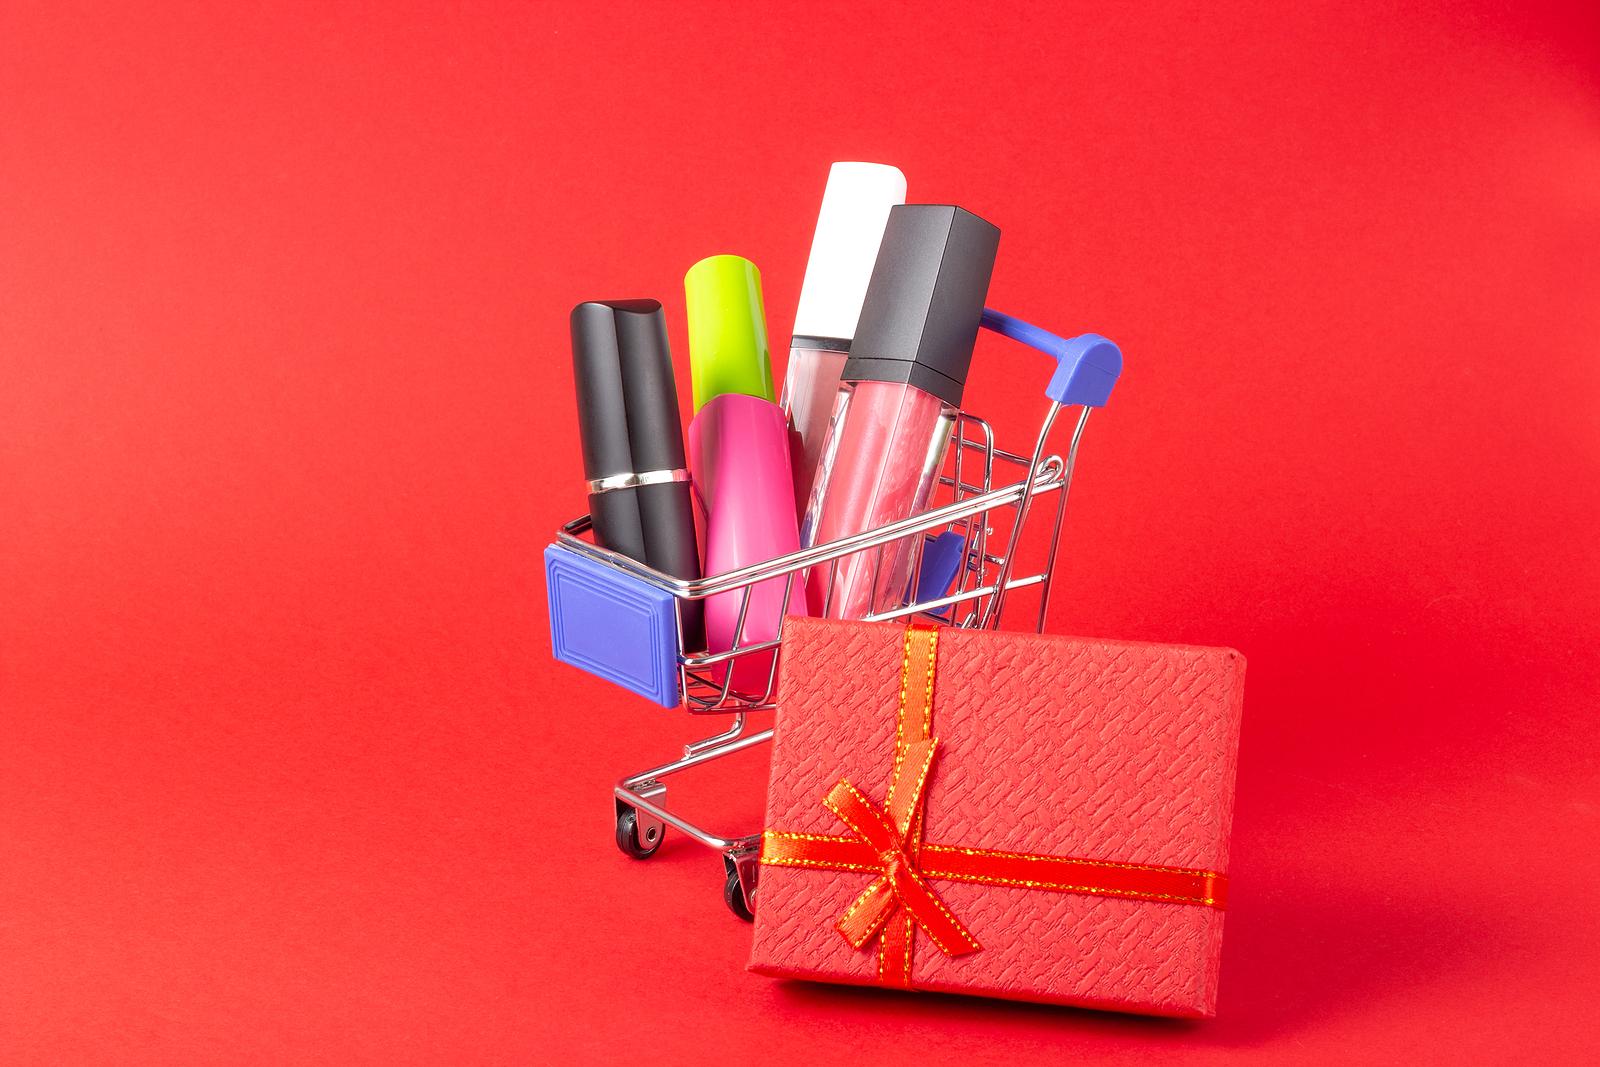 Retail Beauty and Cosmetics stock analysis